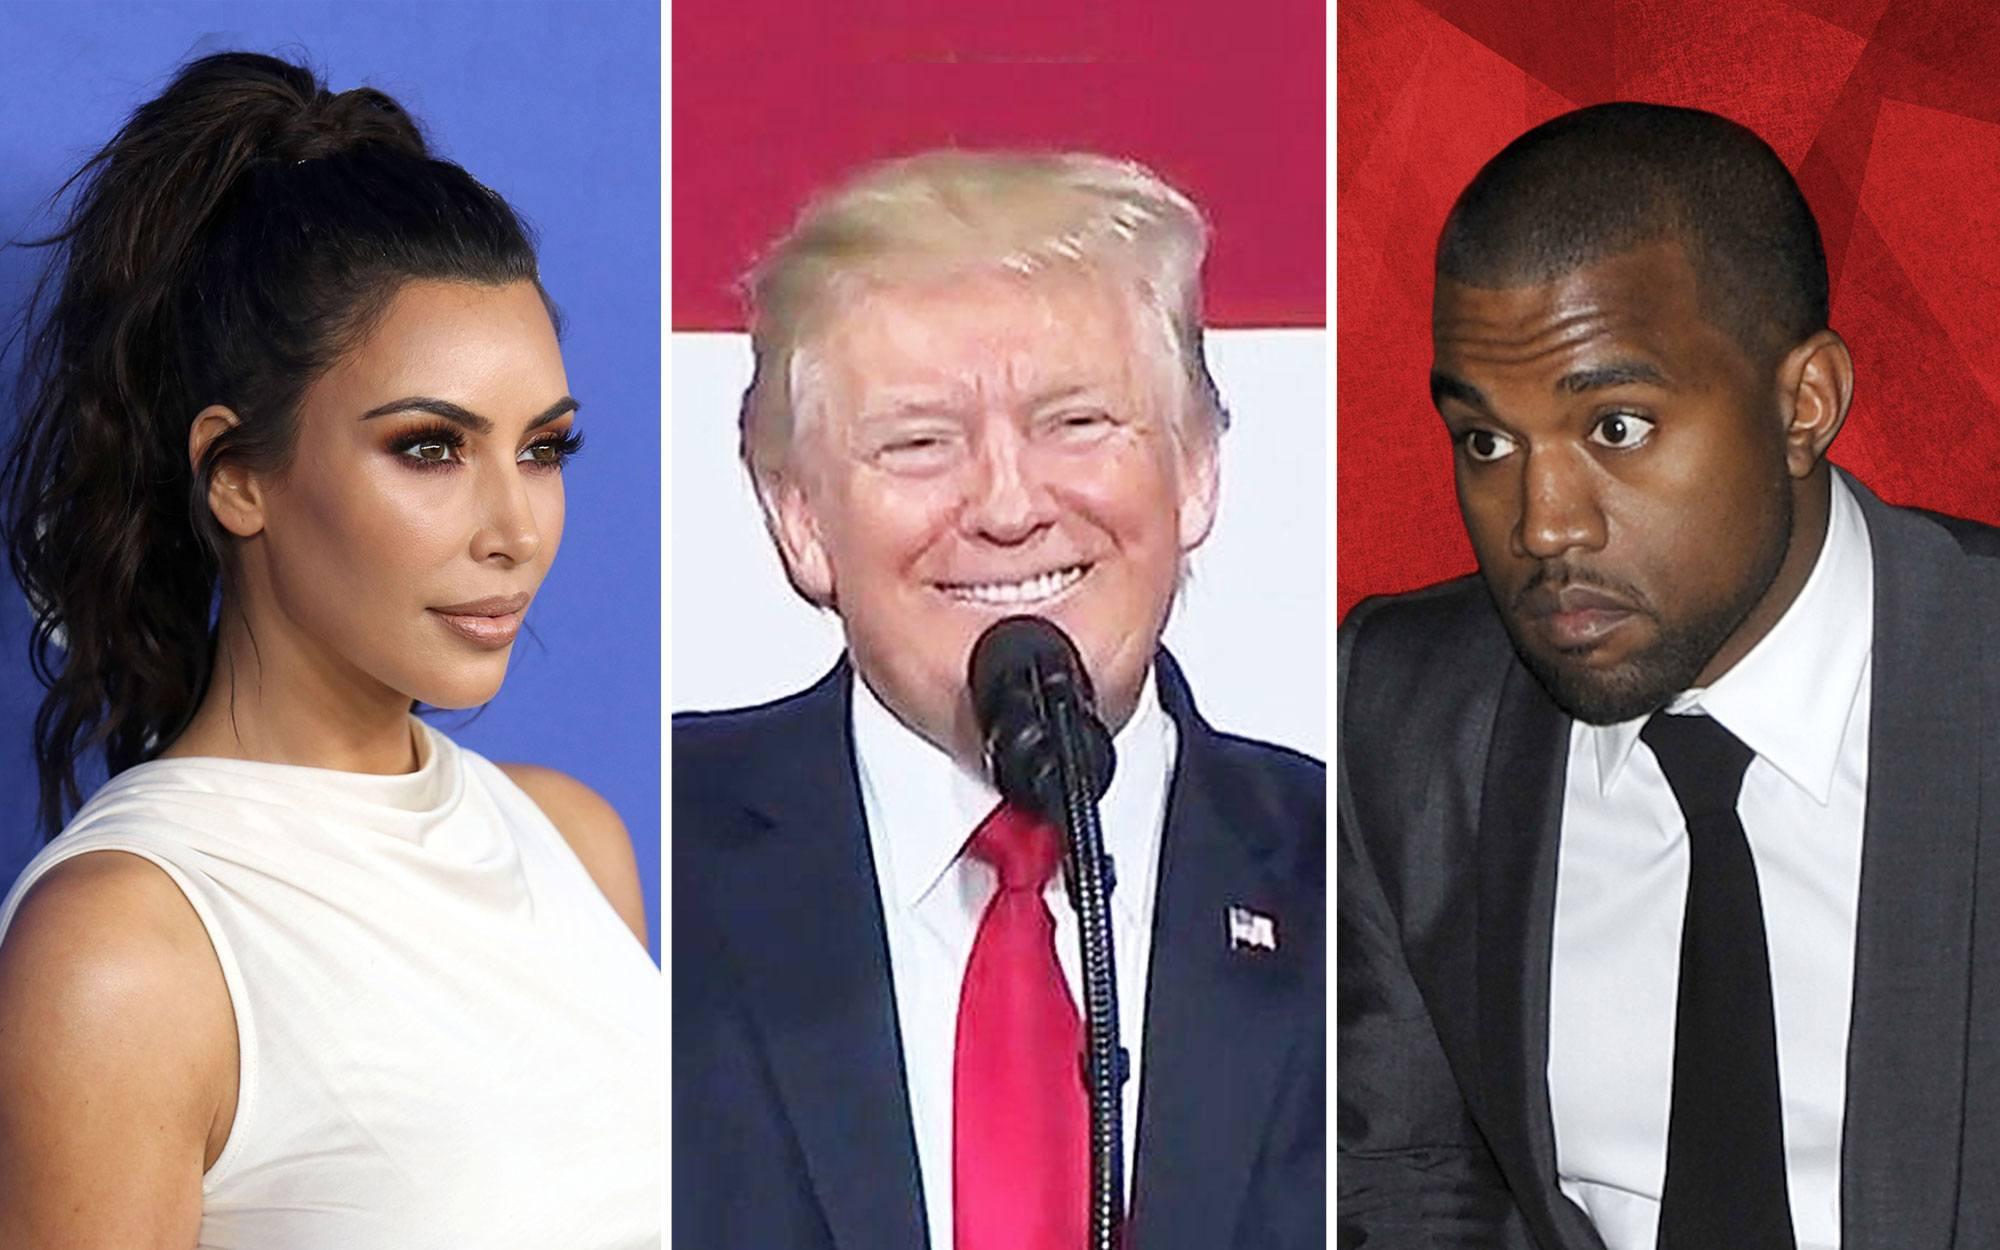 Kim Kardashian Says She Has 'Educated' Kanye West on Trump's Policies